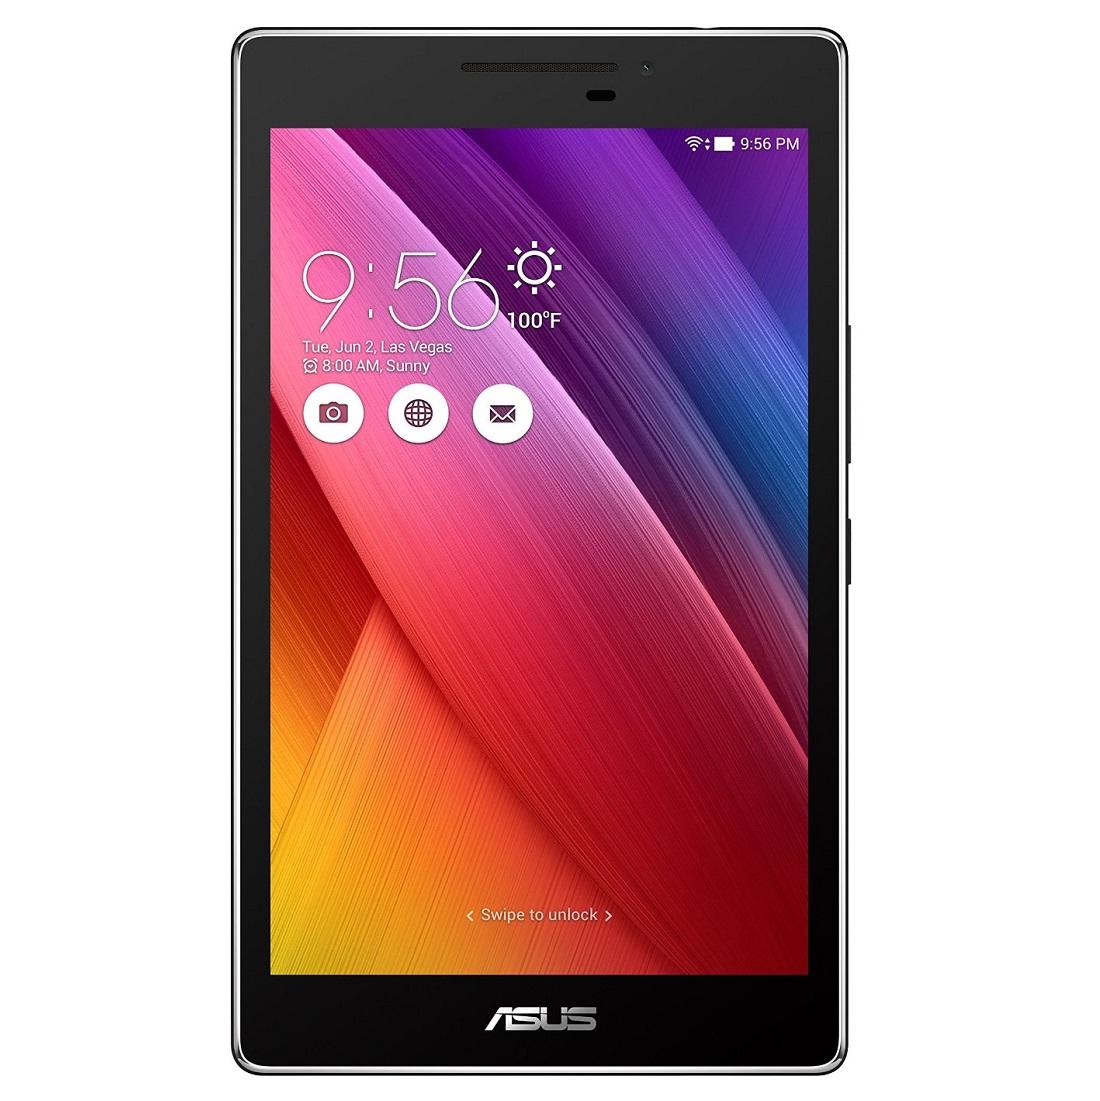 Asus ZenPad 8.0 Z380KL – Hỗ trợ nghe gọi